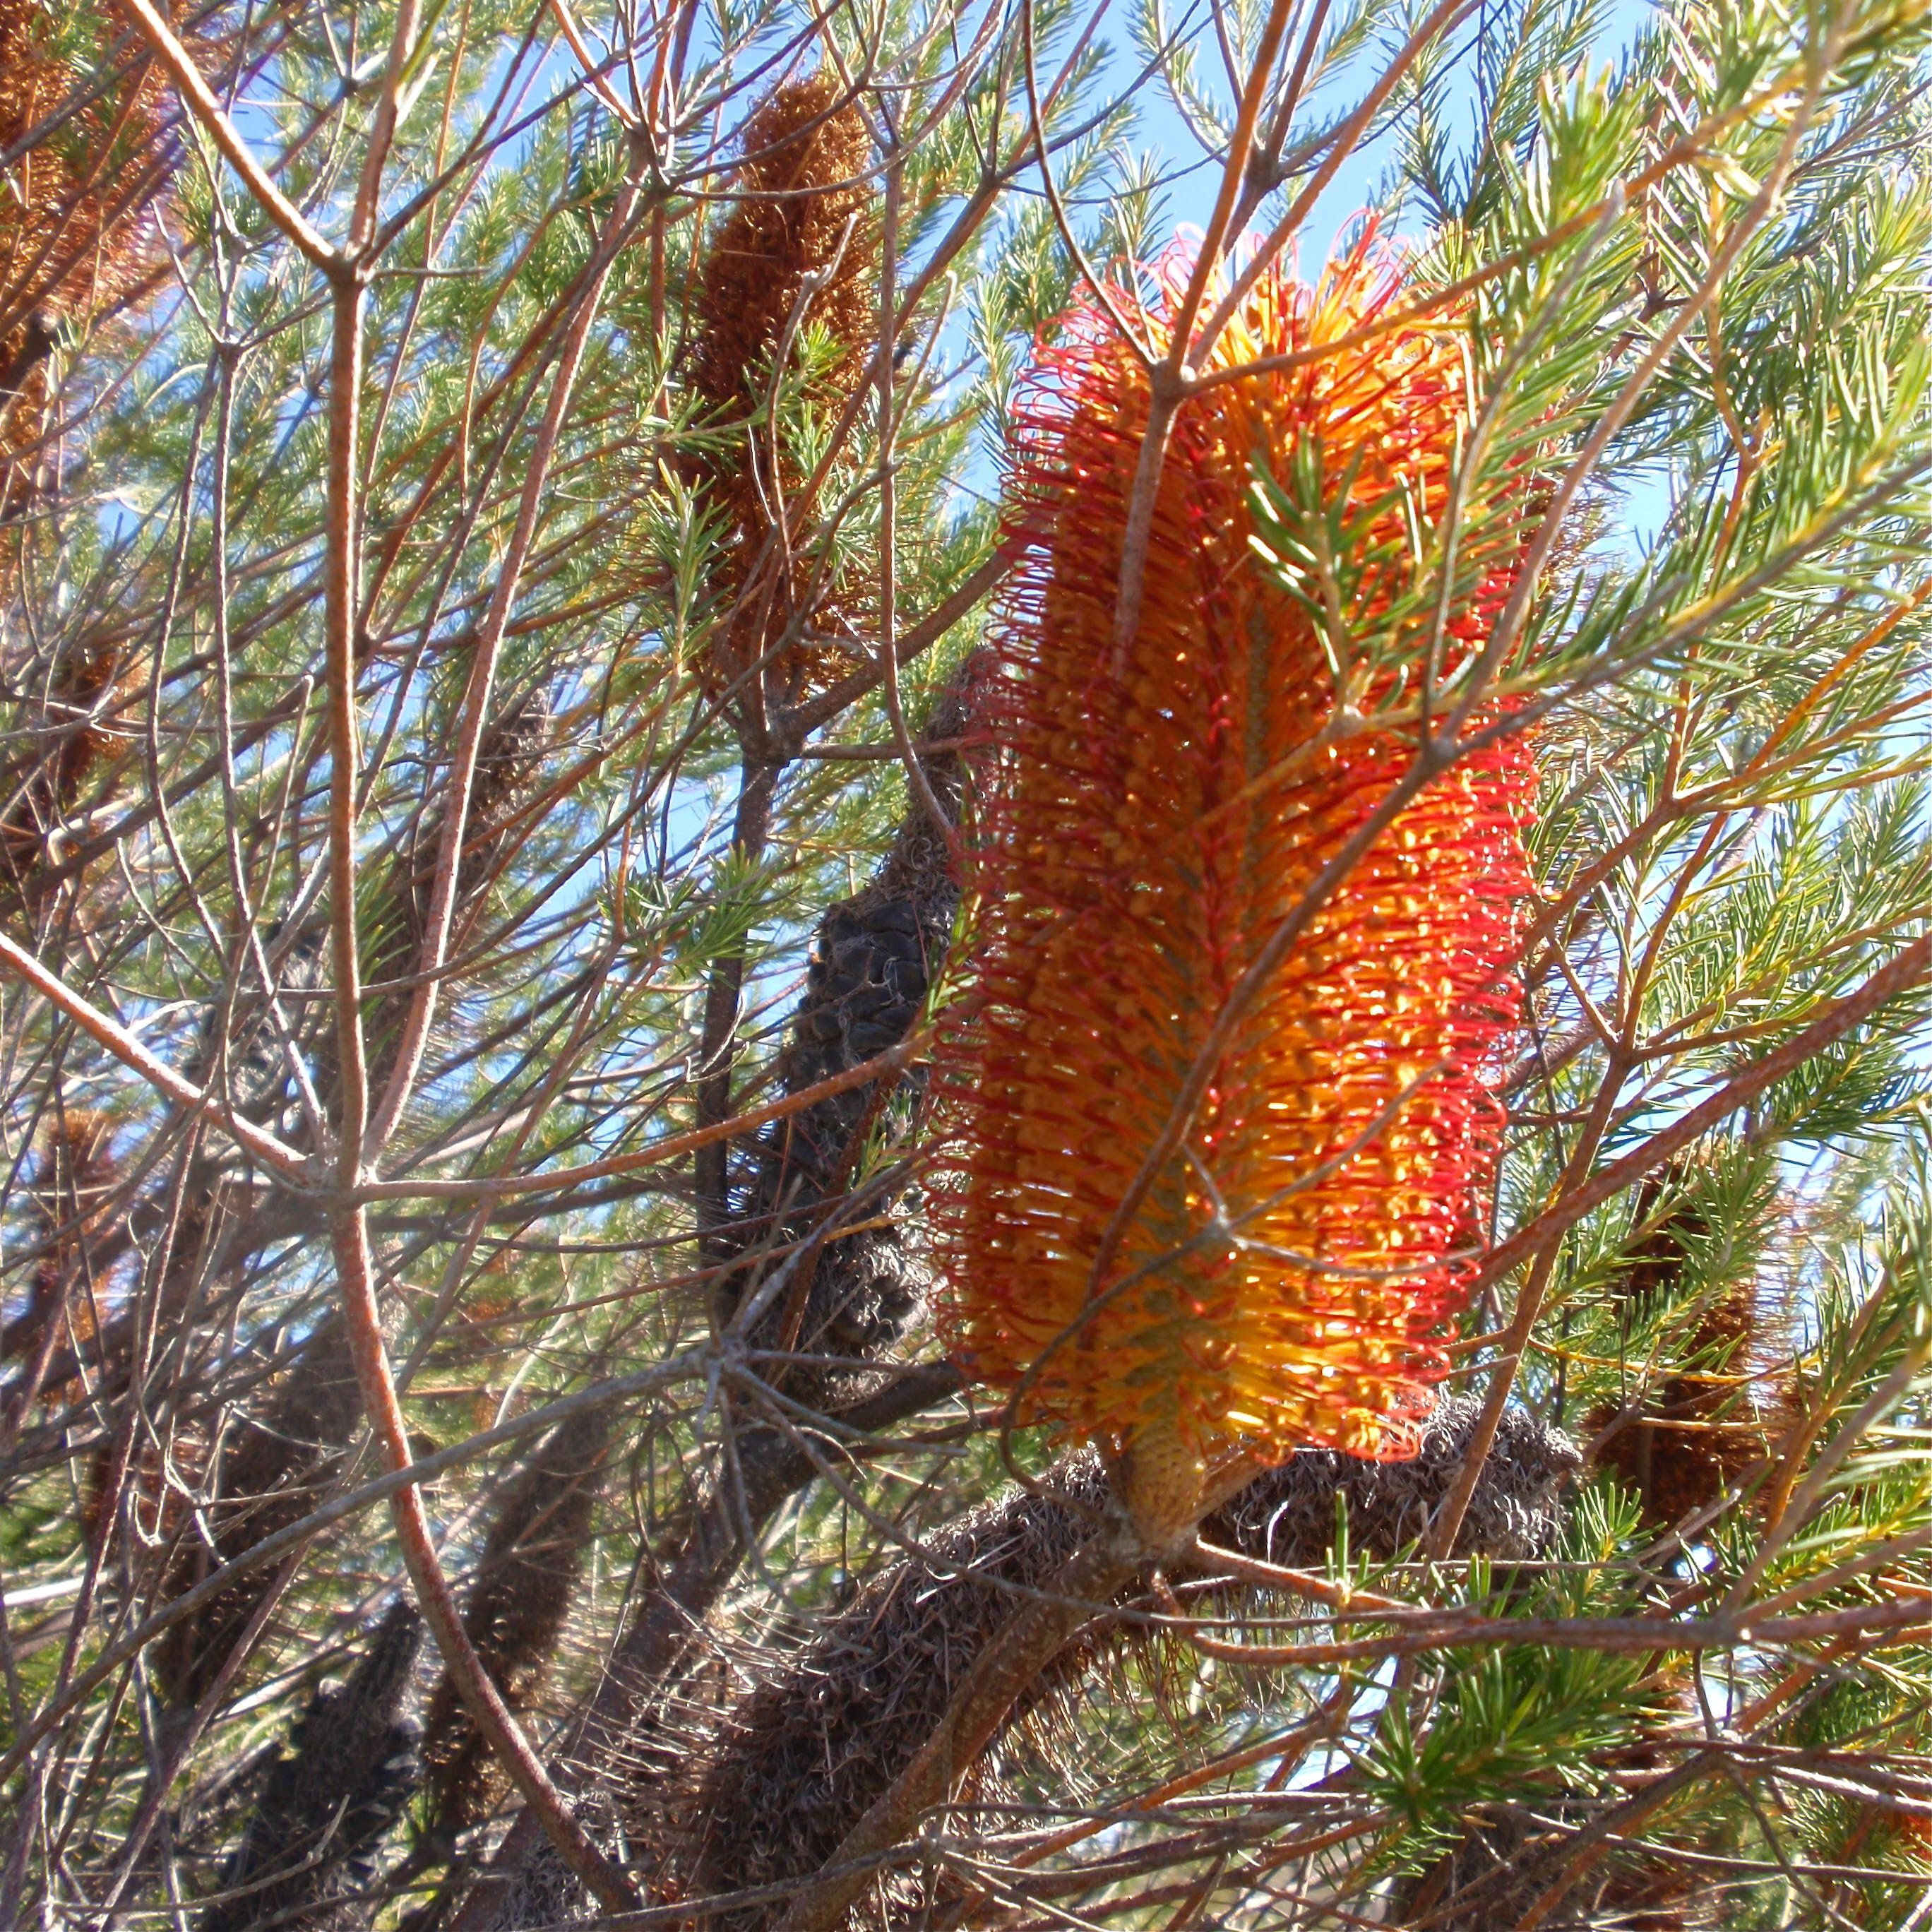 Lennox Head heath - orange banksia